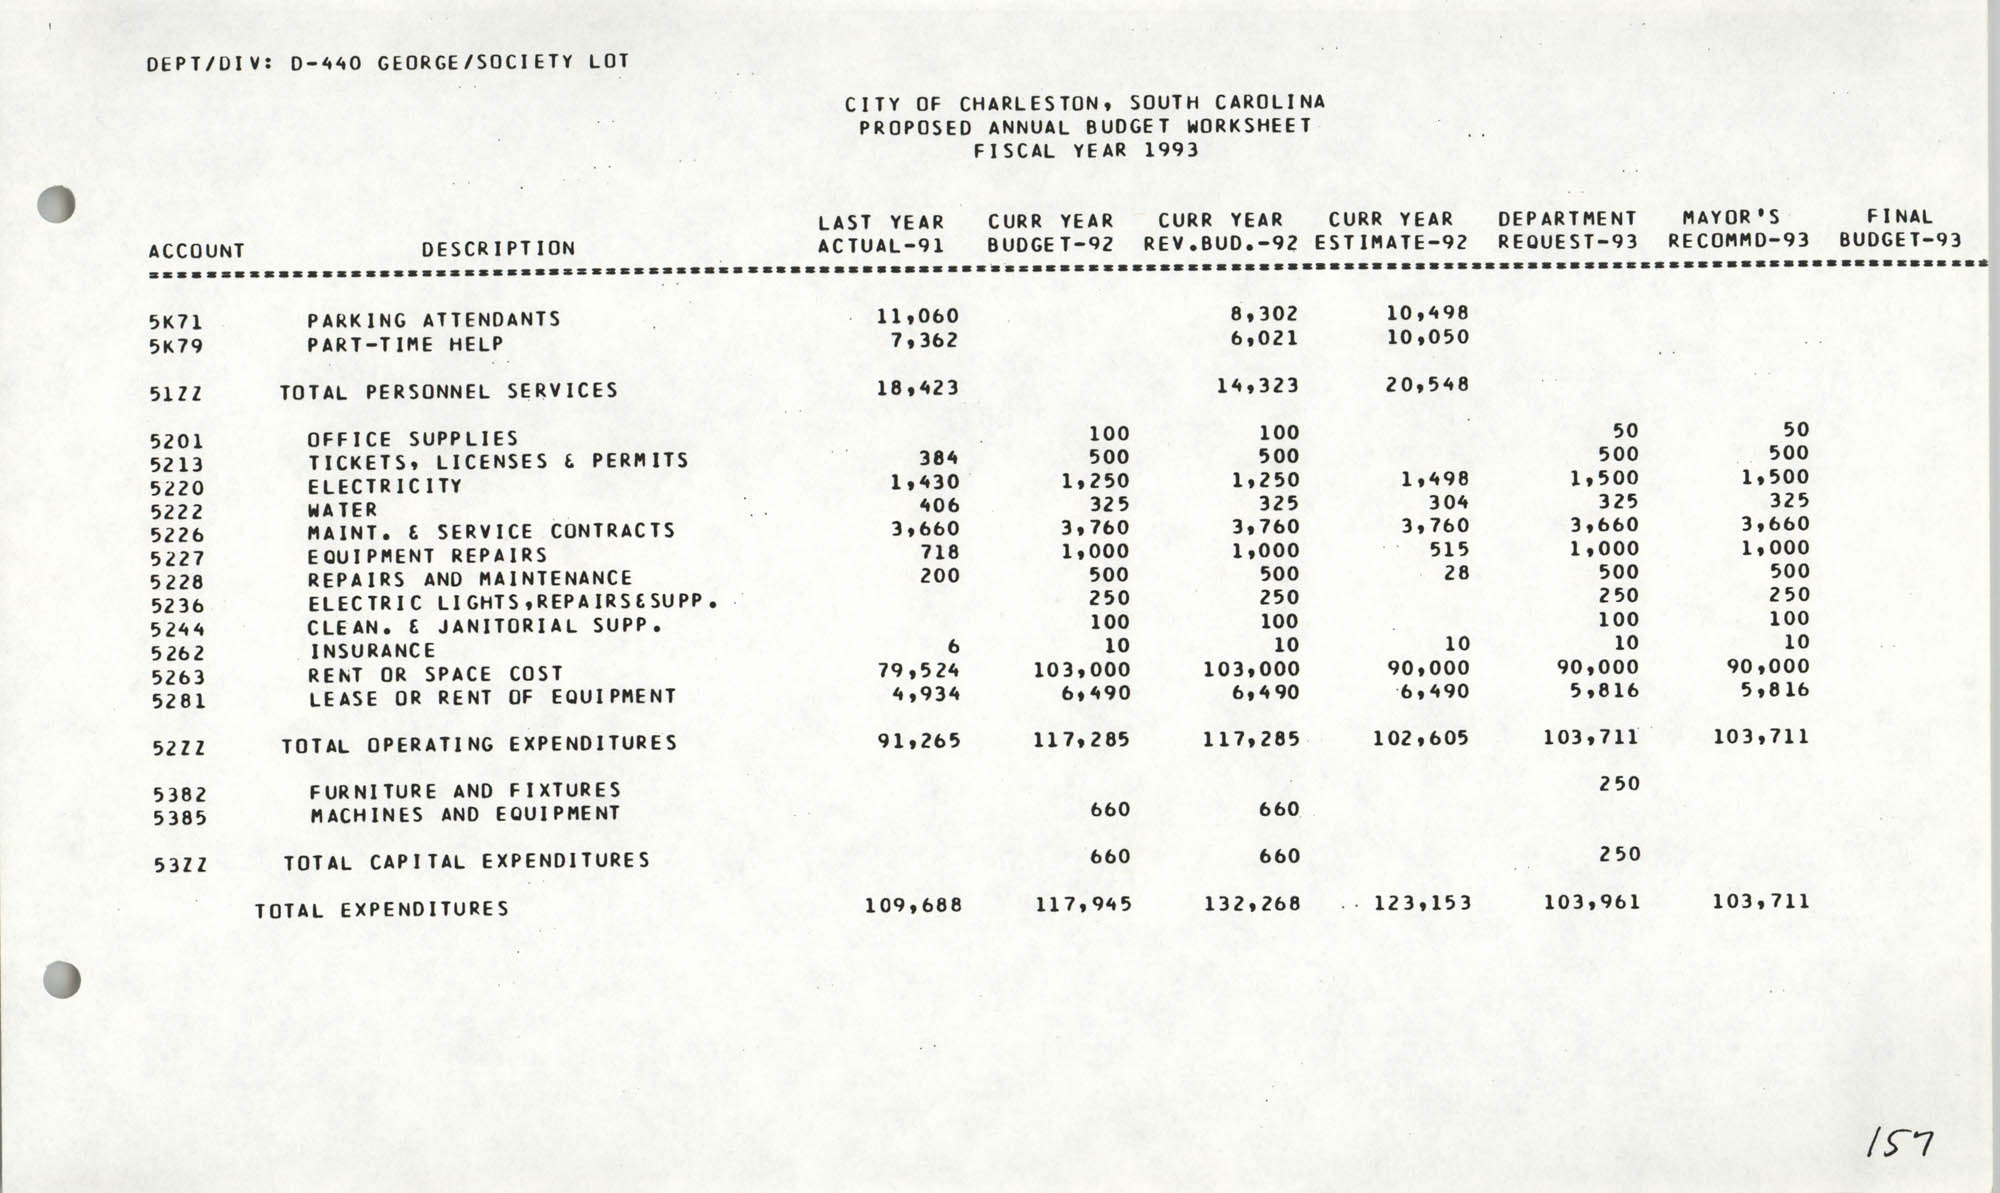 The City Council of Charleston, South Carolina, 1993 Budget, Page 157